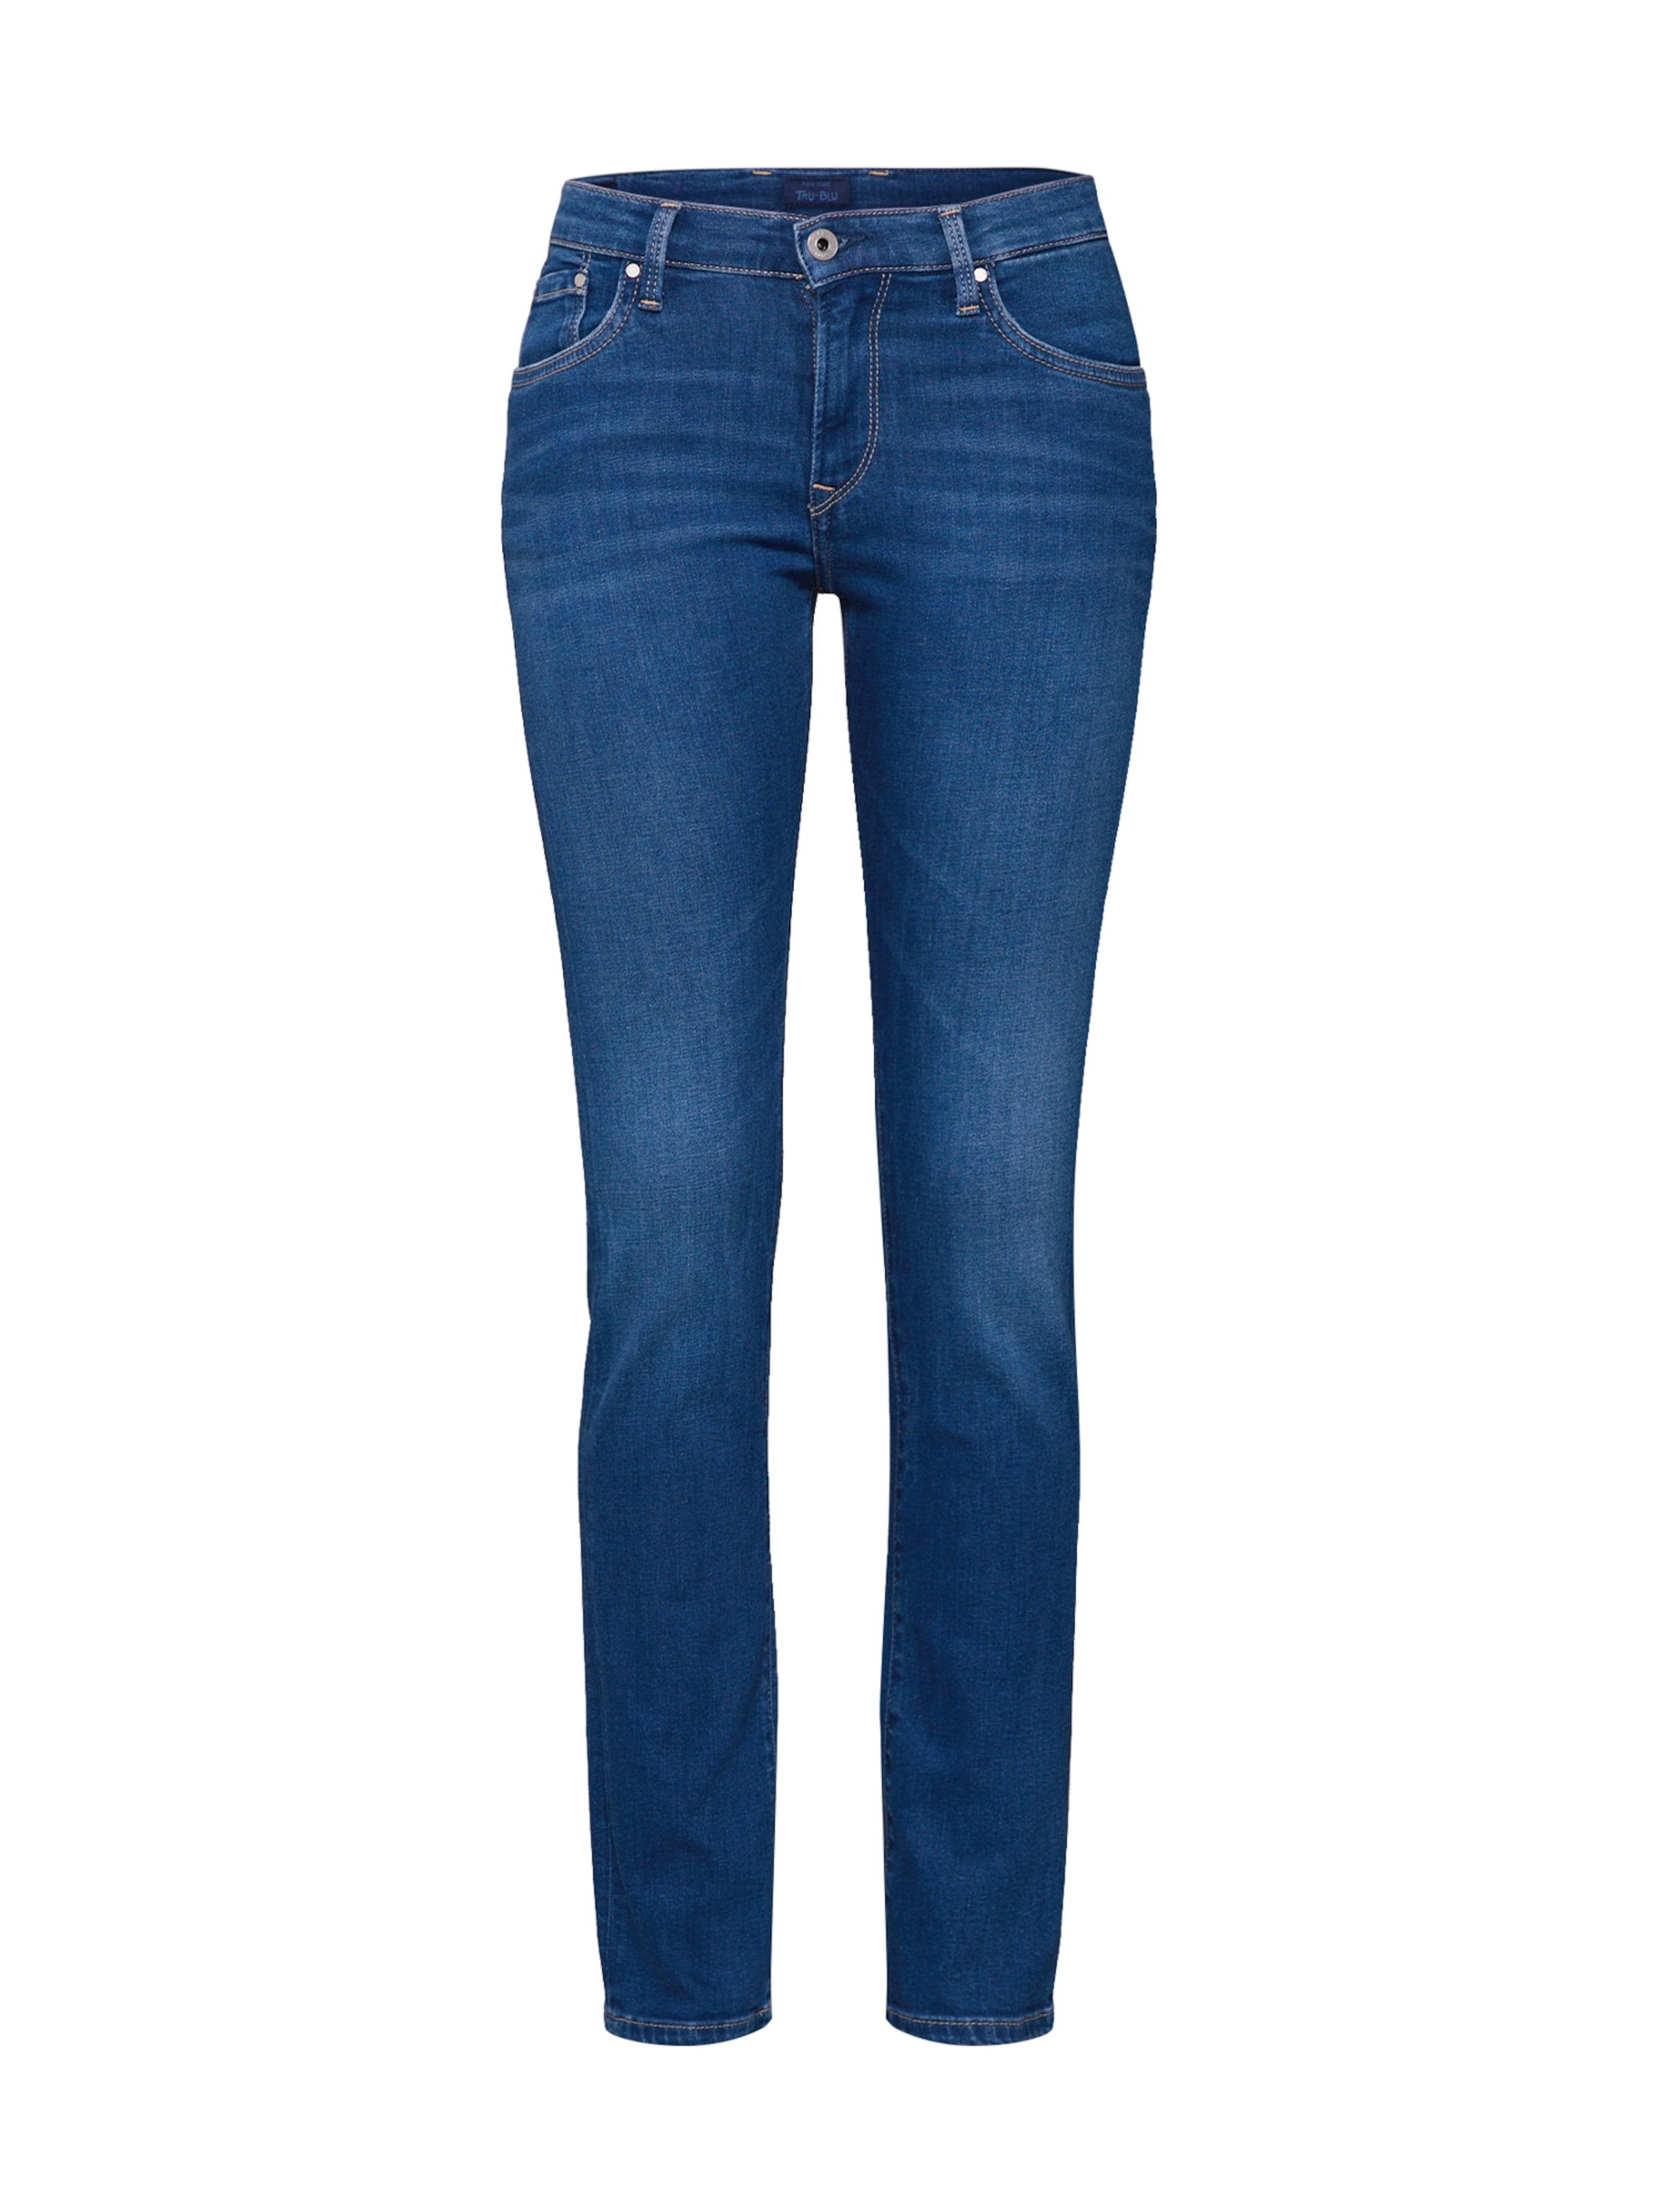 Pepe Jeans 'victoria' Denim In Blue uOTkZXPi